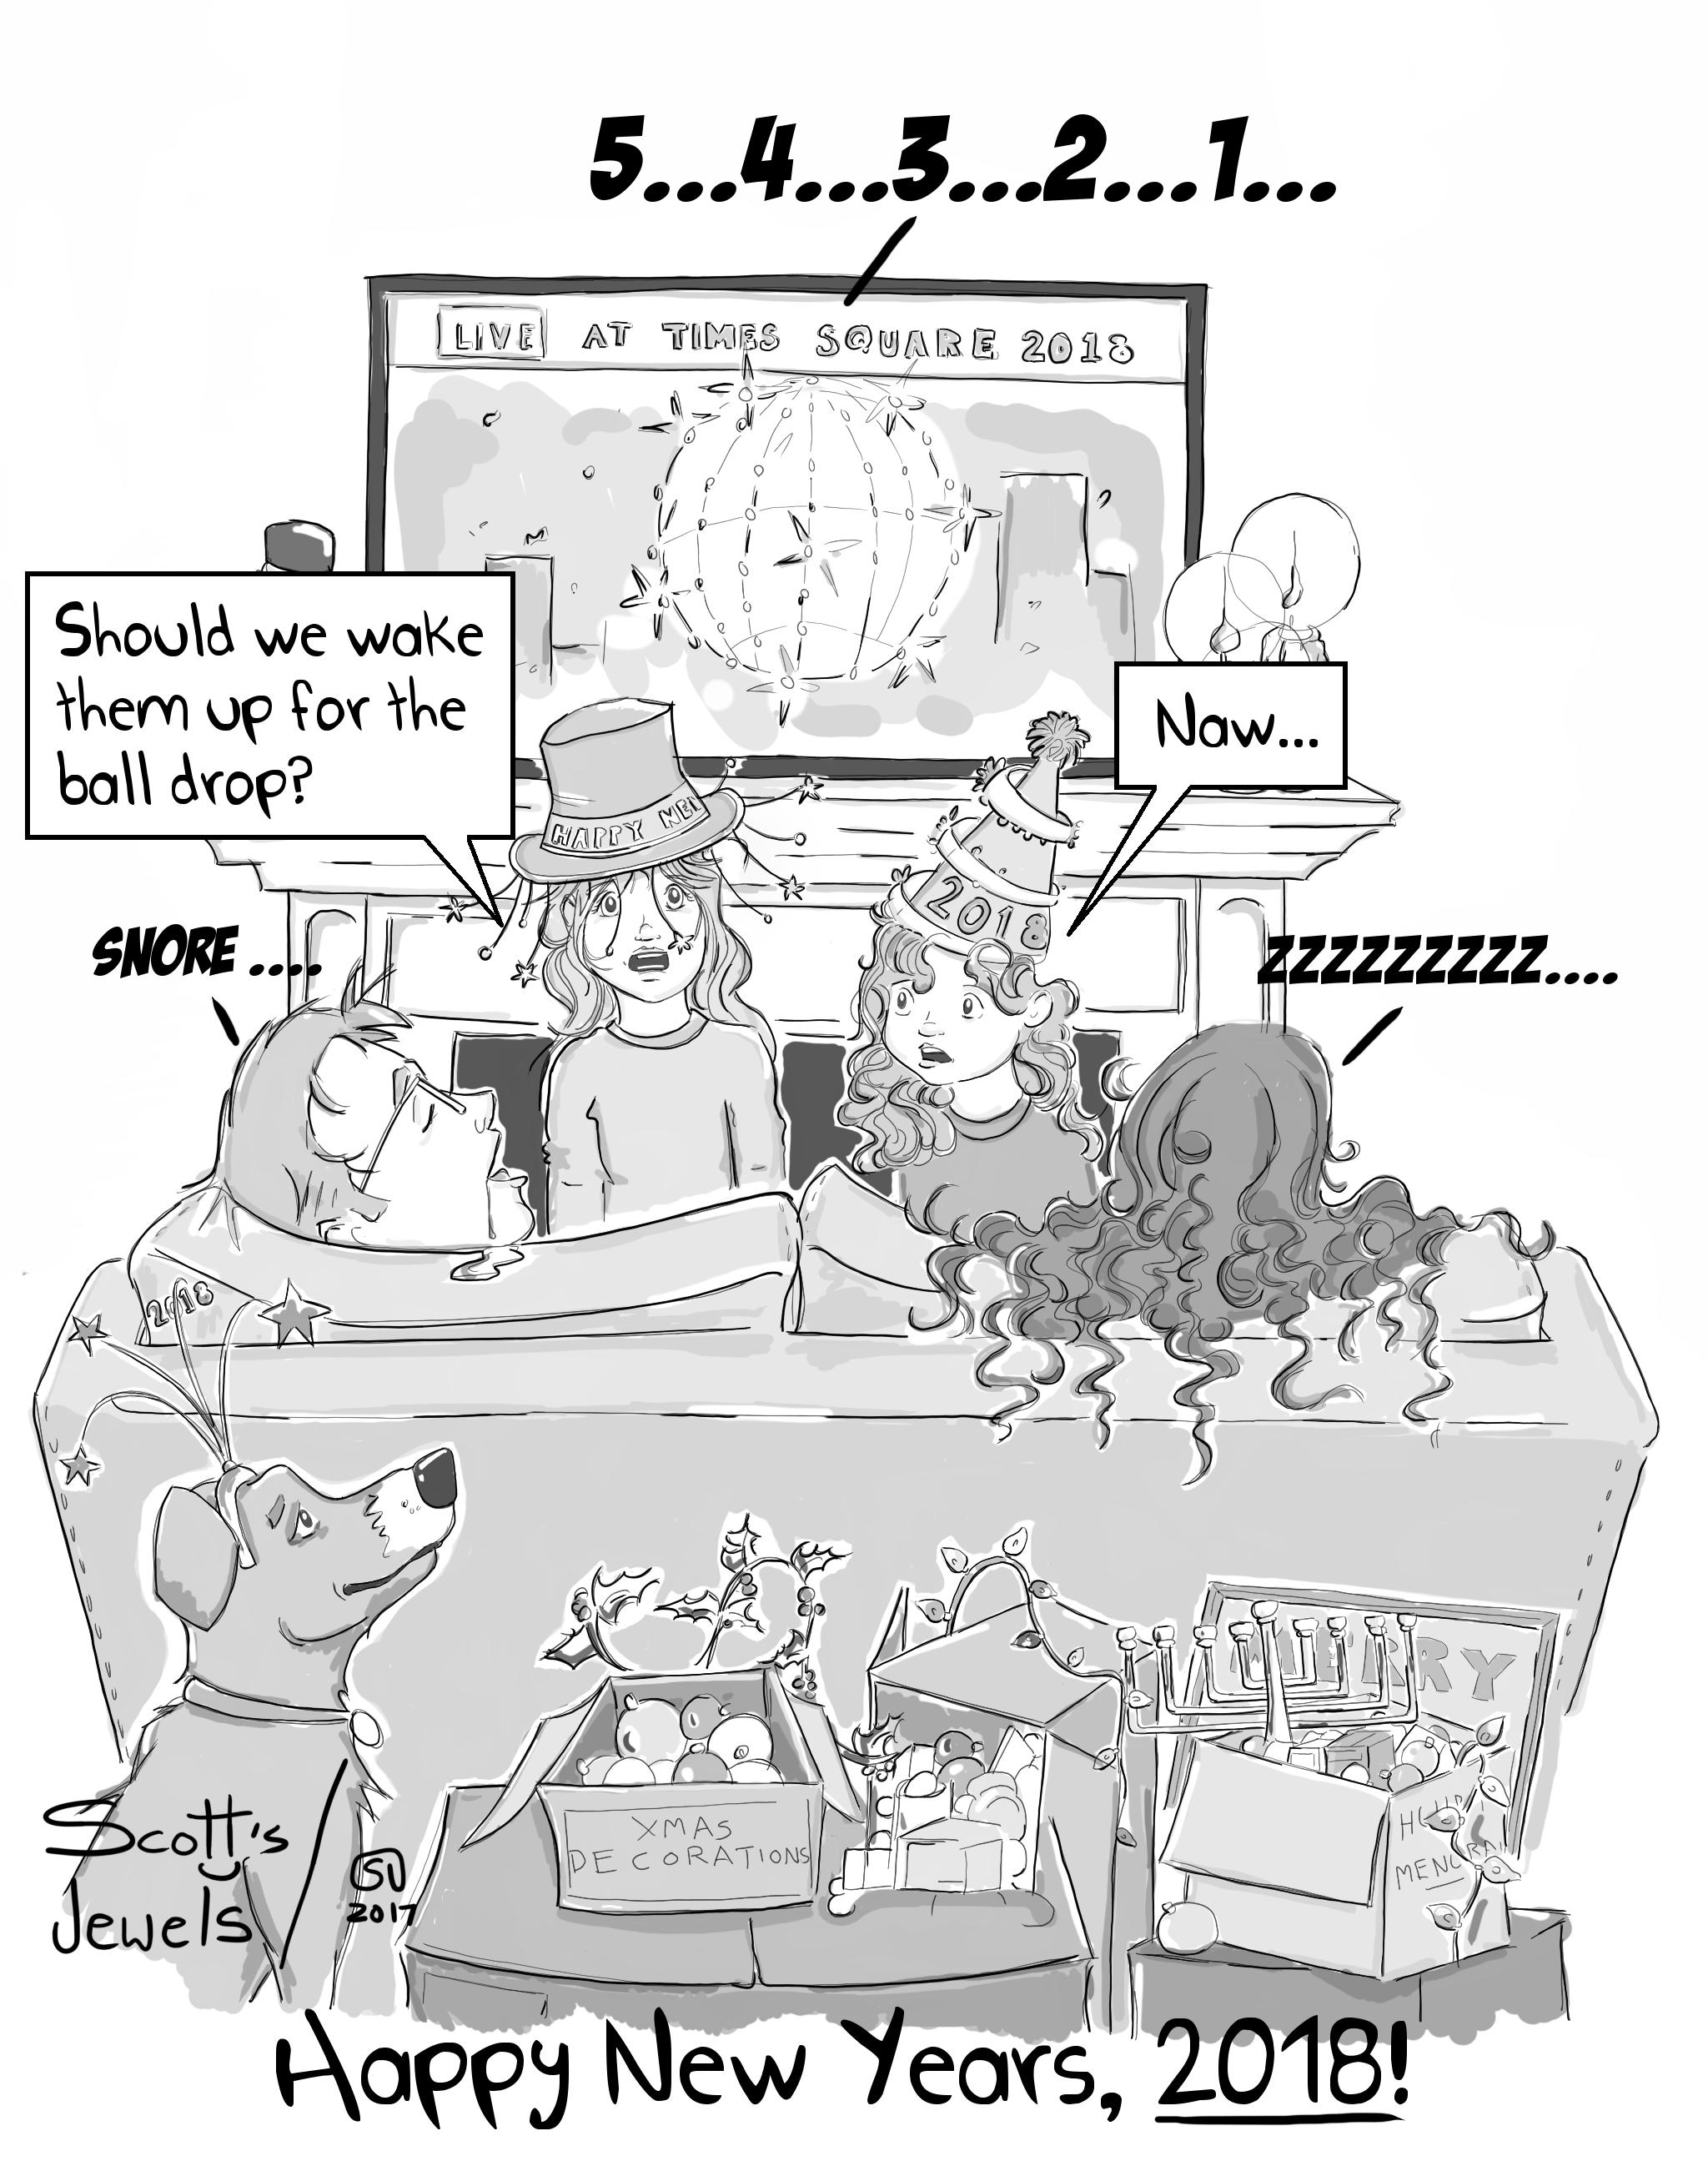 Happy New Years 2018 We Fell Asleep Midnight Parenting Fail Family Holidays #Comic